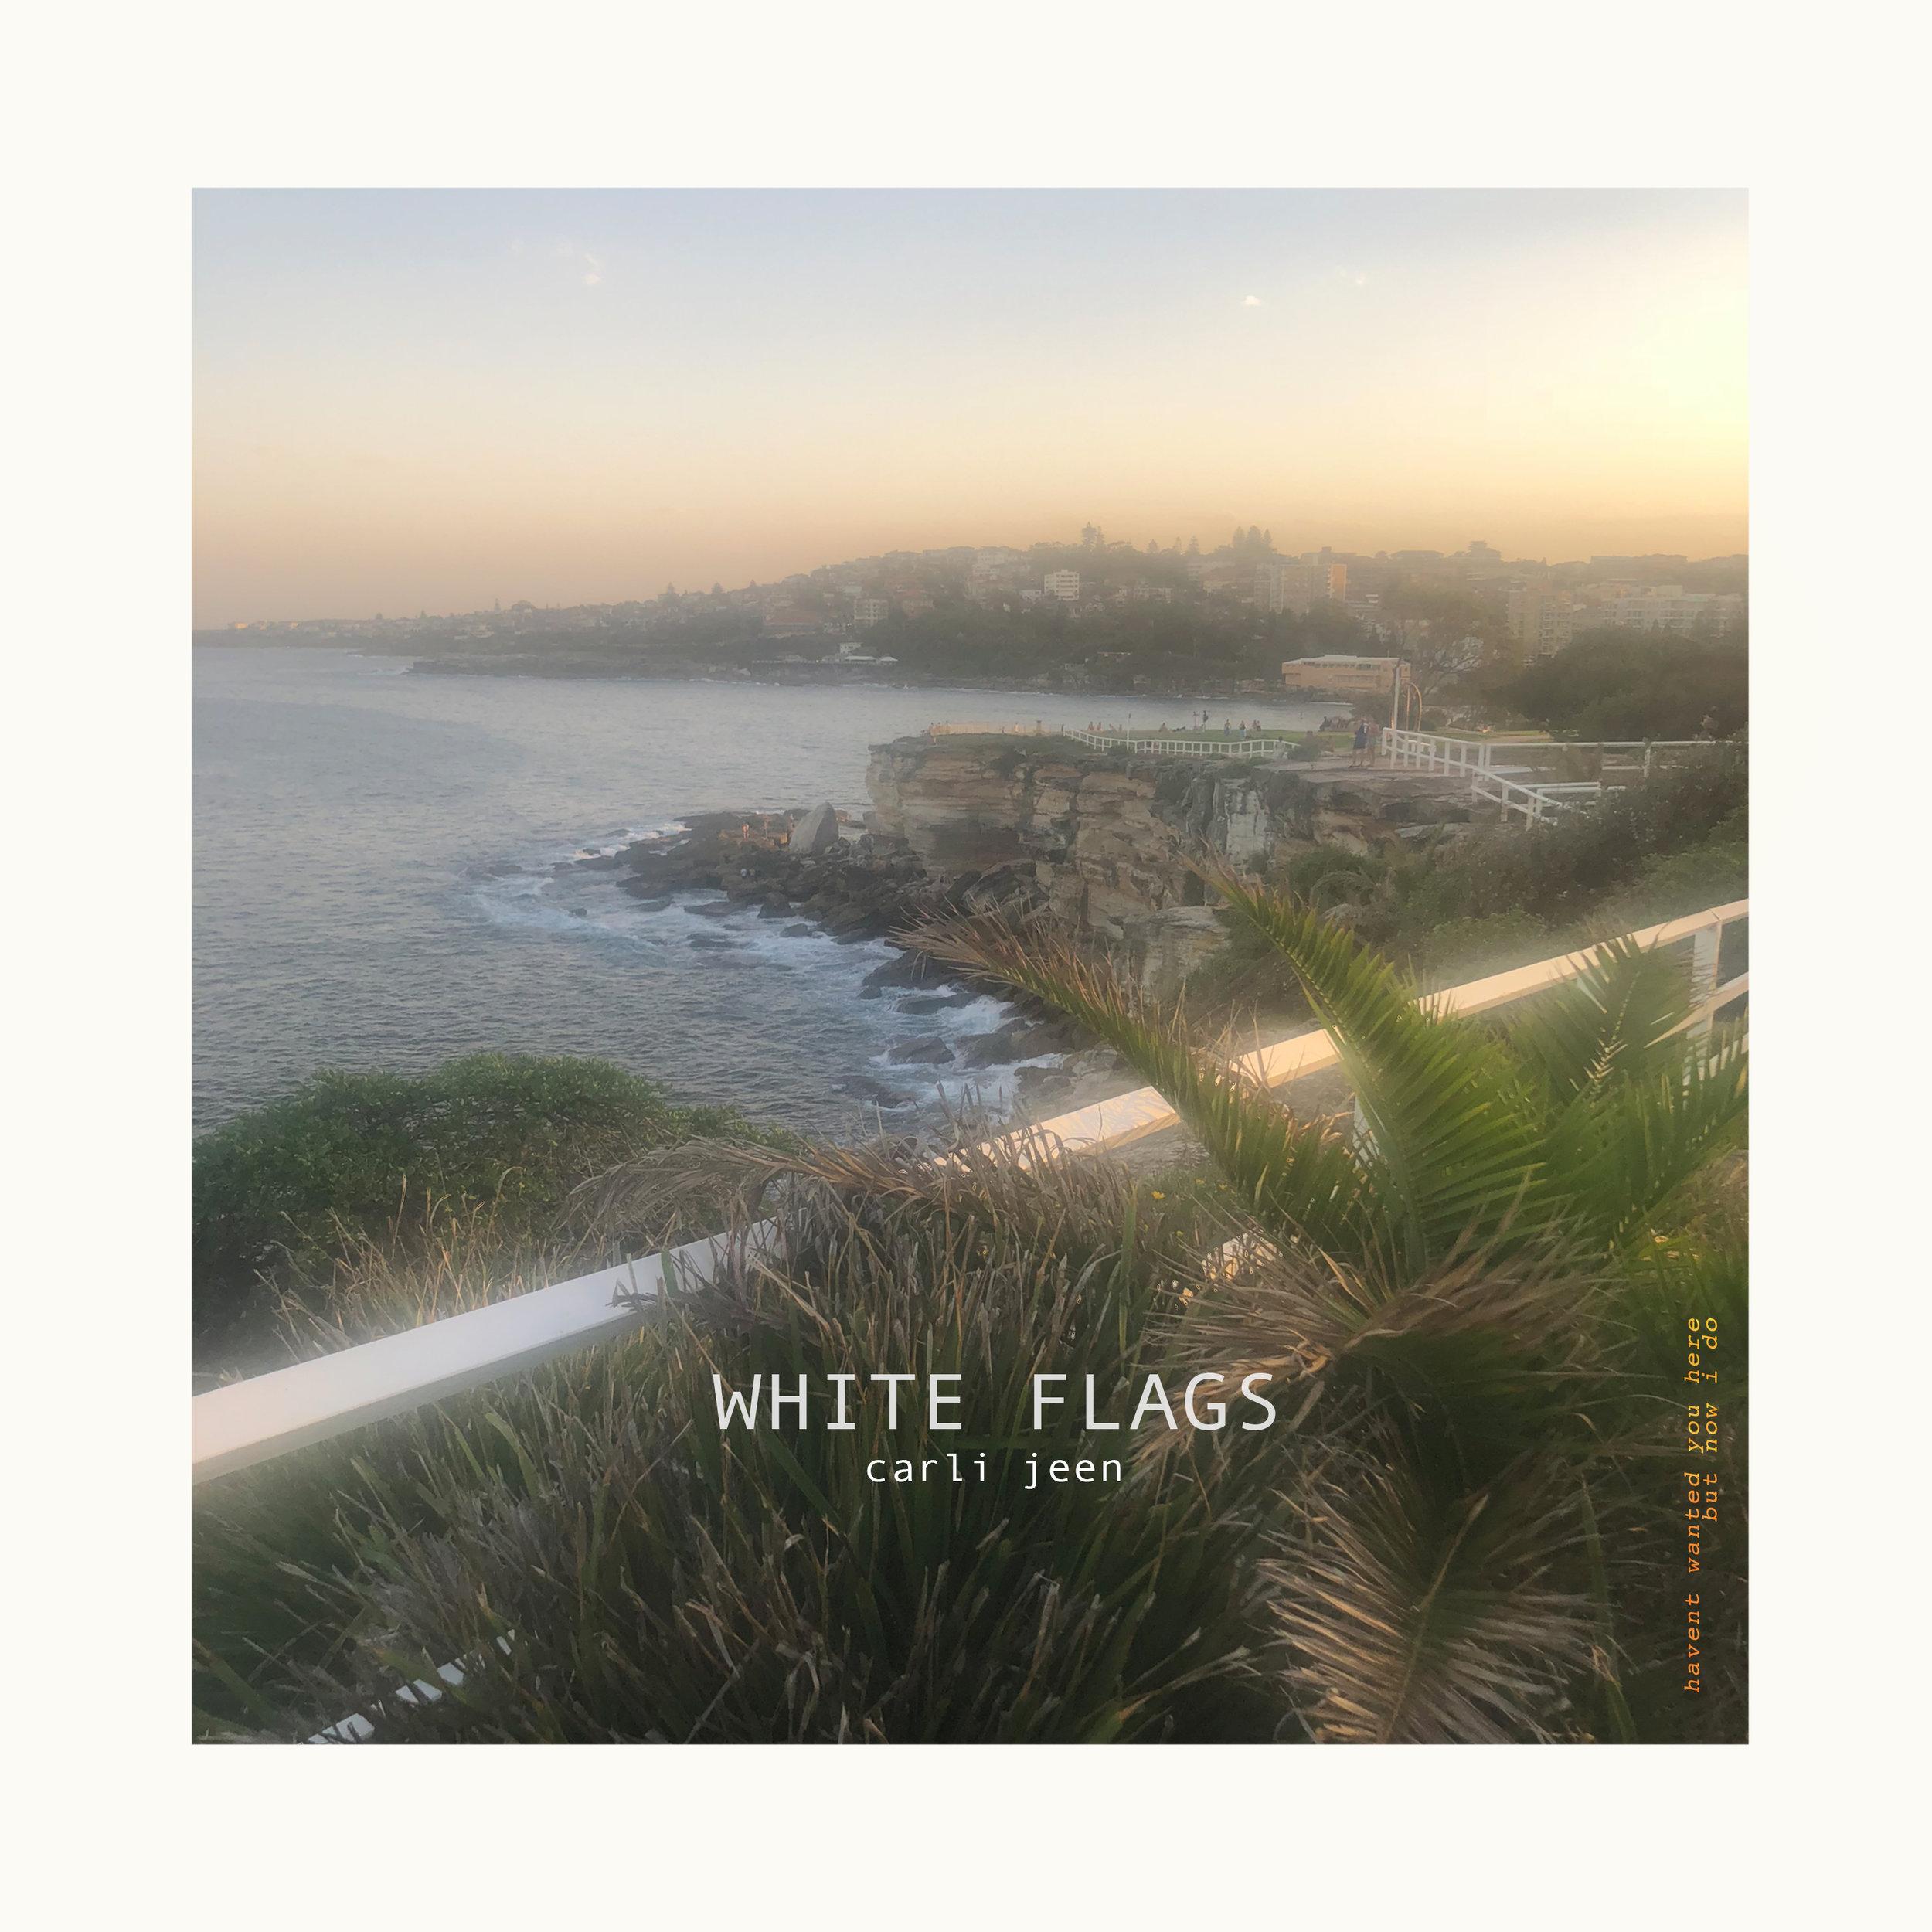 WHITEFLAGS_COVER.jpg